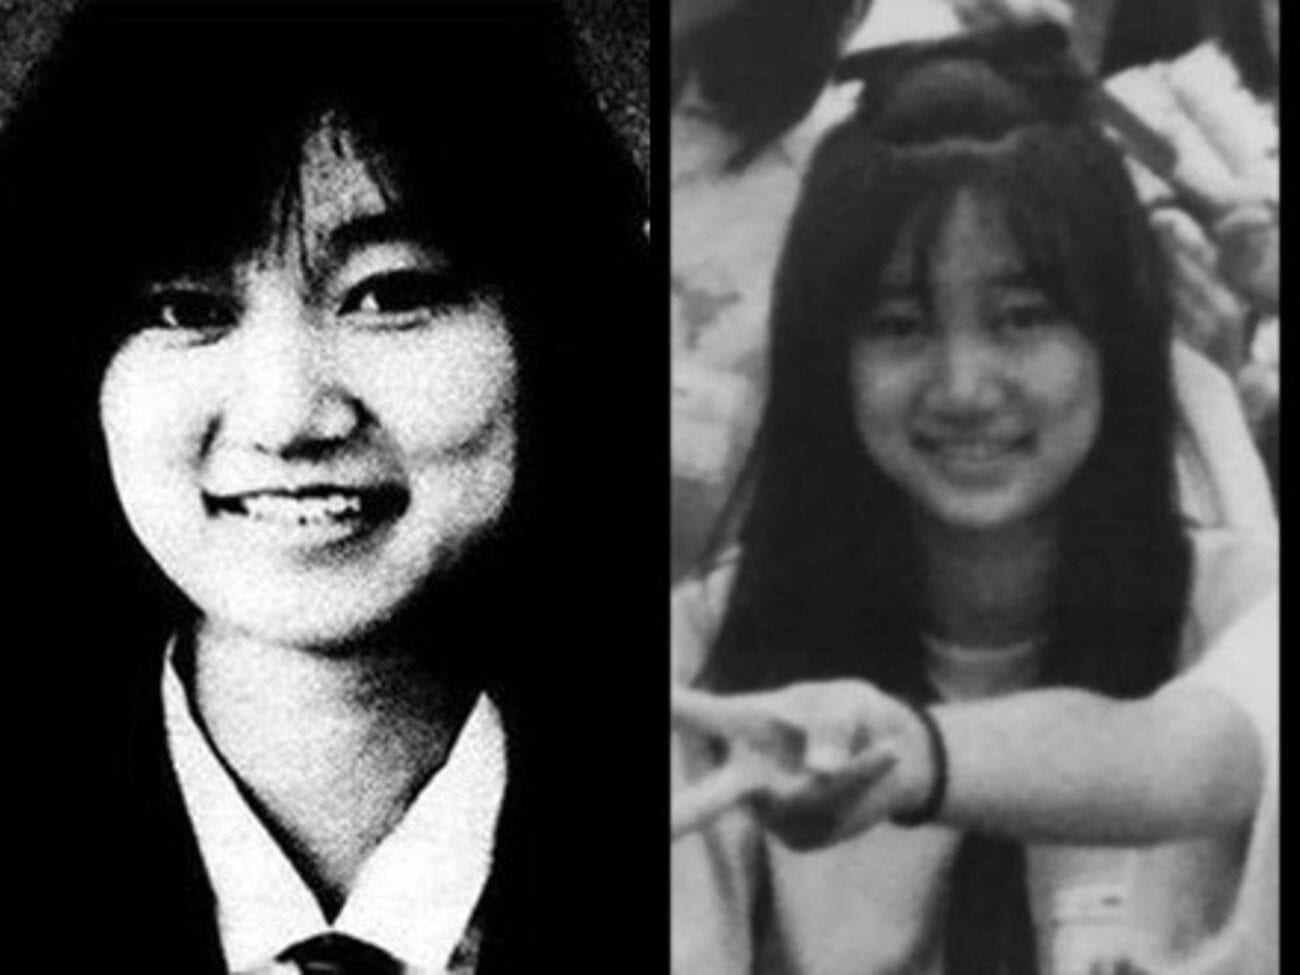 Kisah Junko Furuta, Cerita Tragis yang Jadi Perbincangan di TikTok